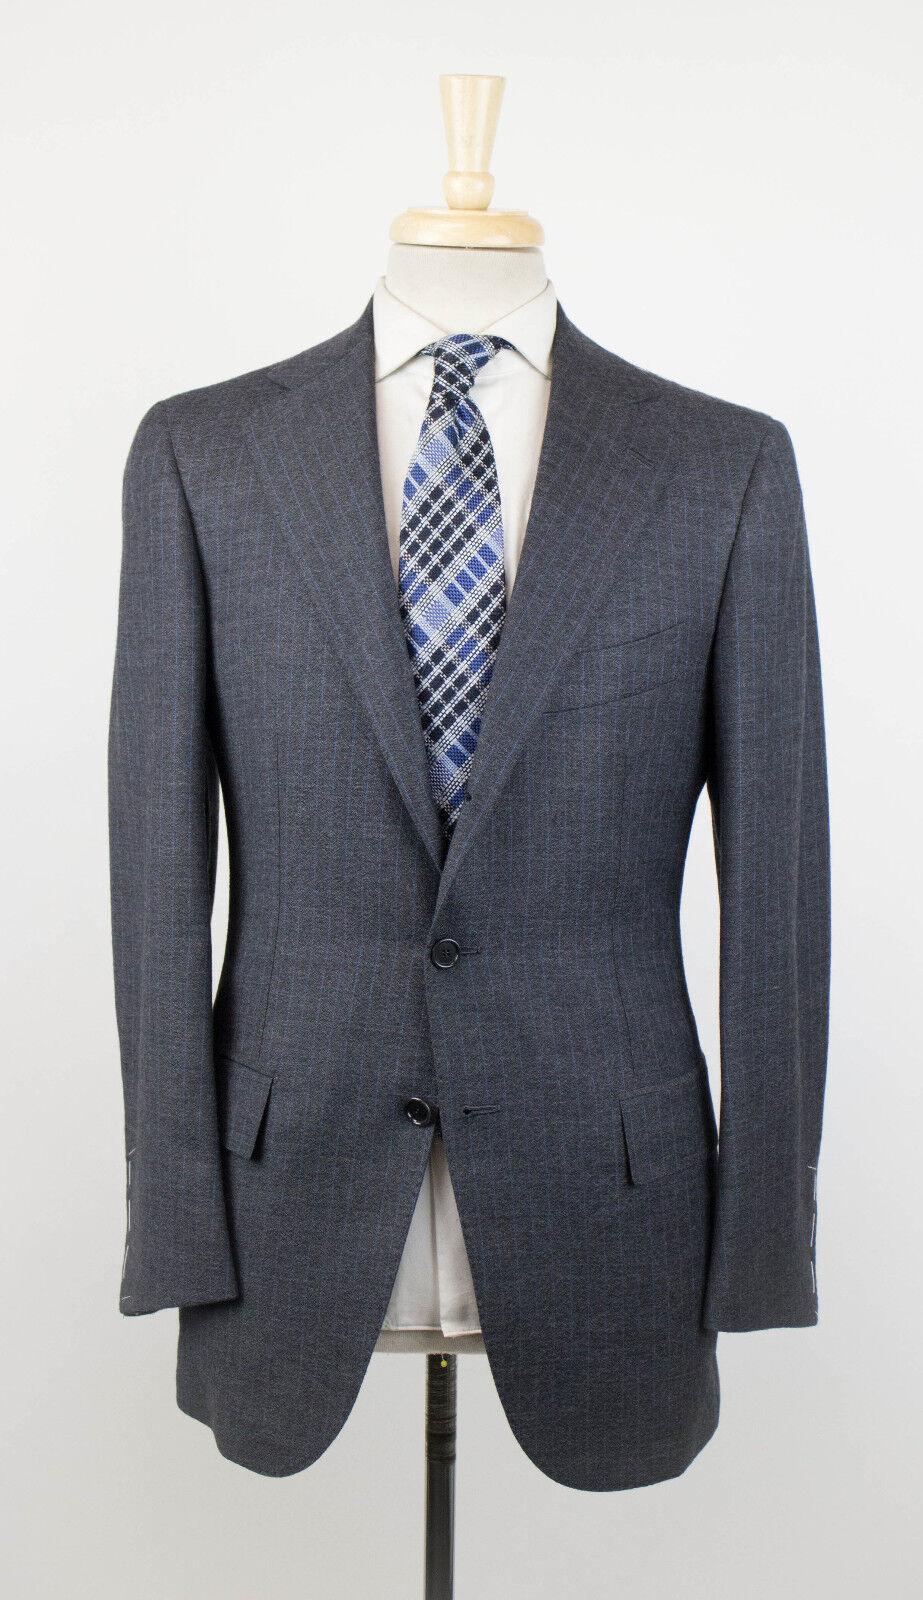 NWT CESARE ATTOLINI NAPOLI grau Striped Wool 3/2 Button Suit 46/36R Drop 7 5695